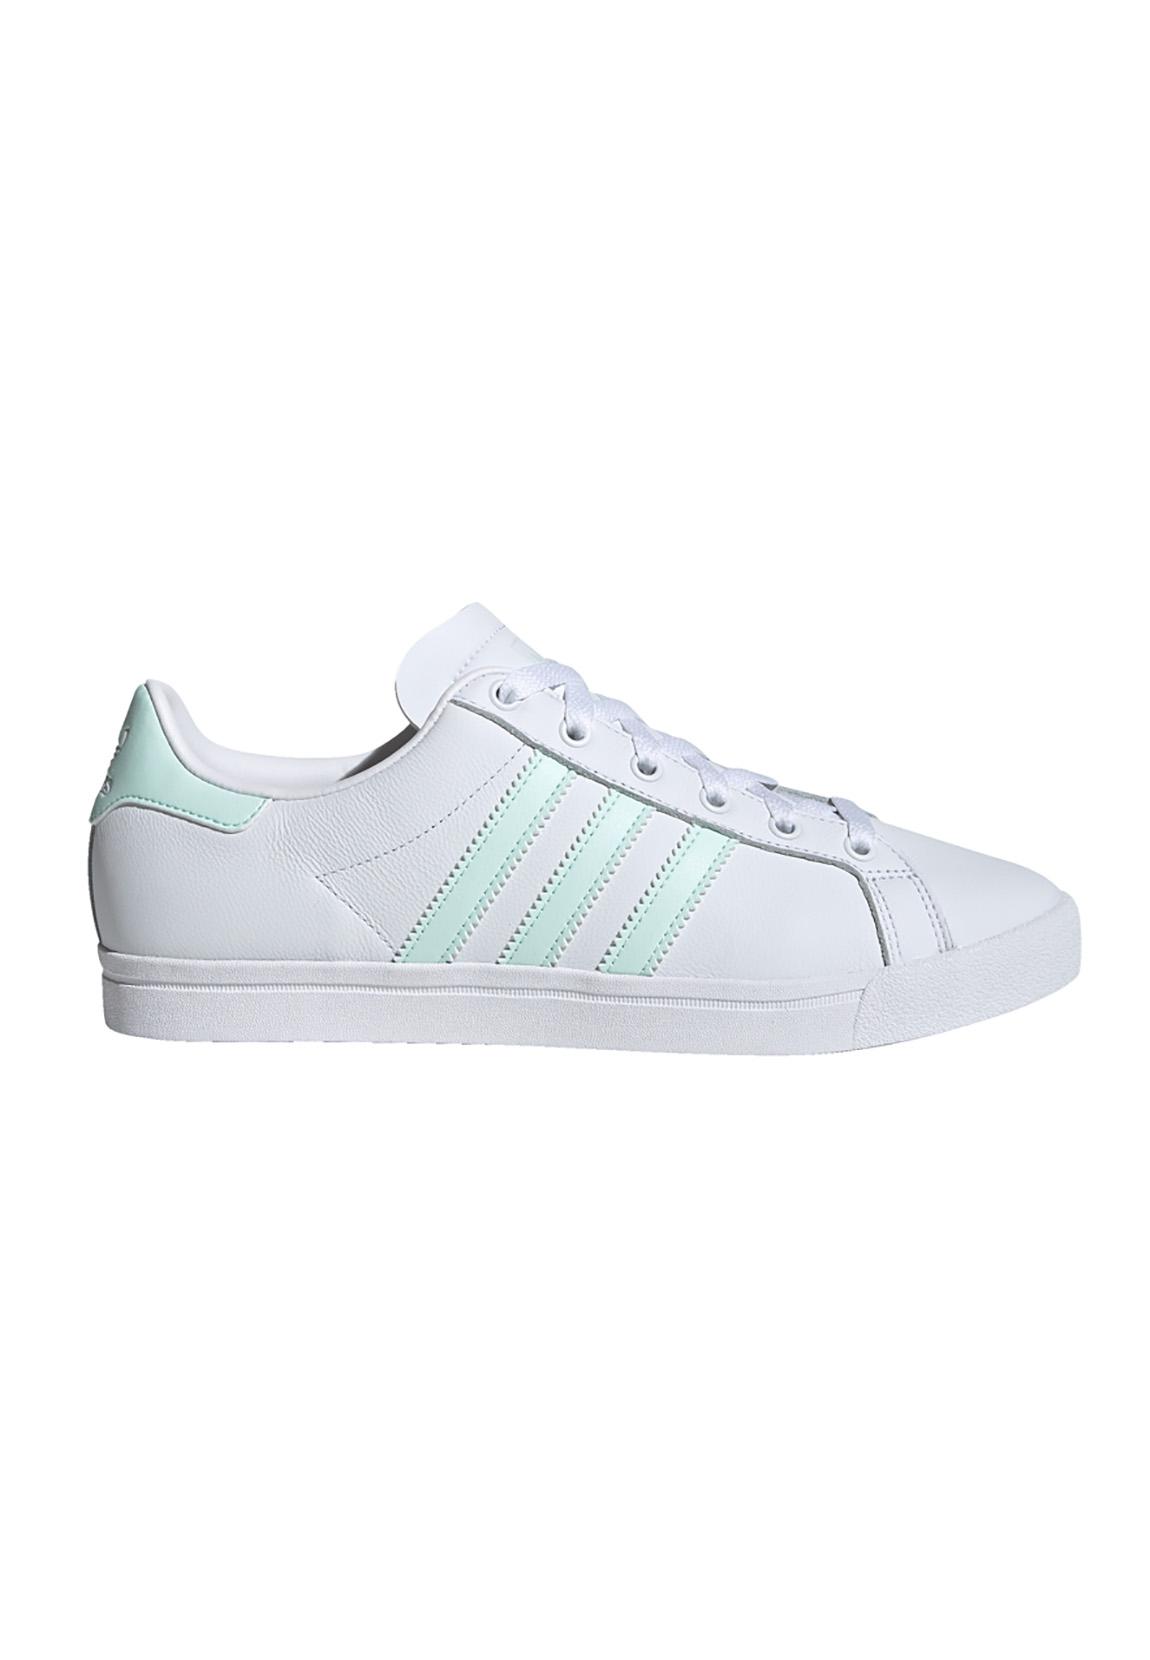 Adidas Originals Trainers Coast Star EE8911 White Mint  1ab6f3c068e